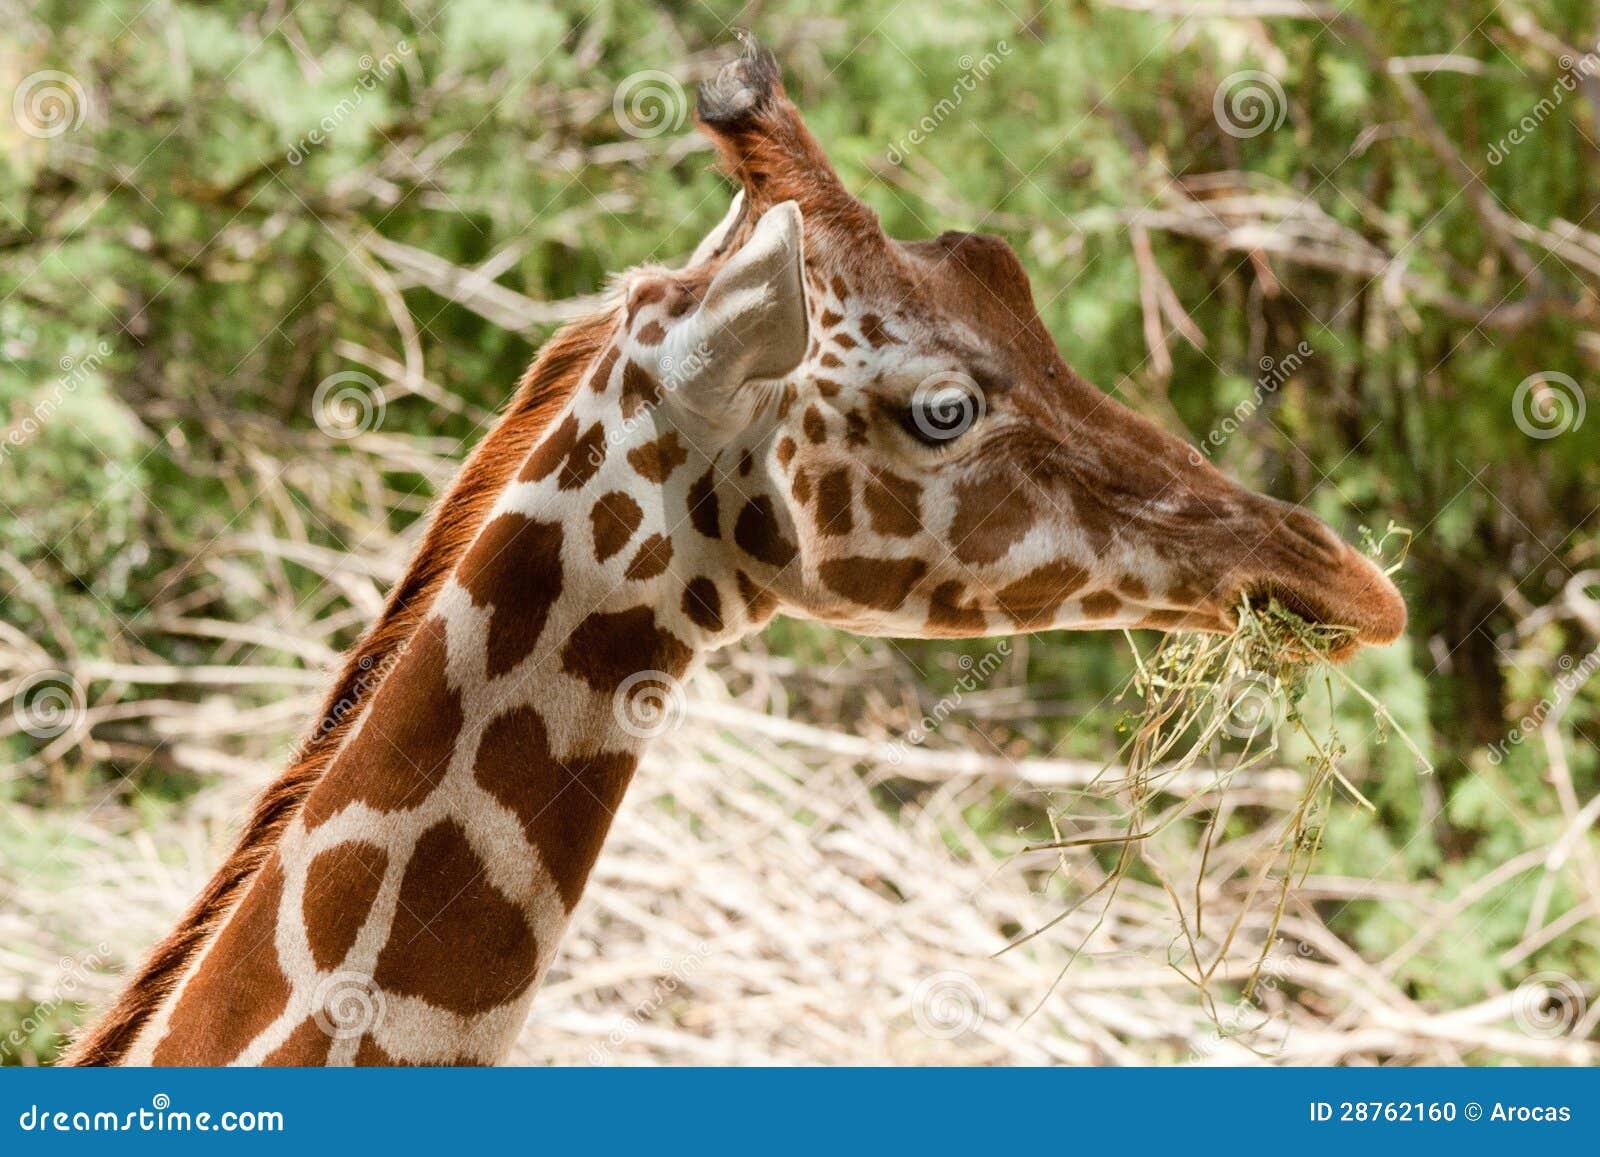 Habitat on web habitat technology group - Giraffa Camelopardalis Peralta Stock Photo Image 28762160